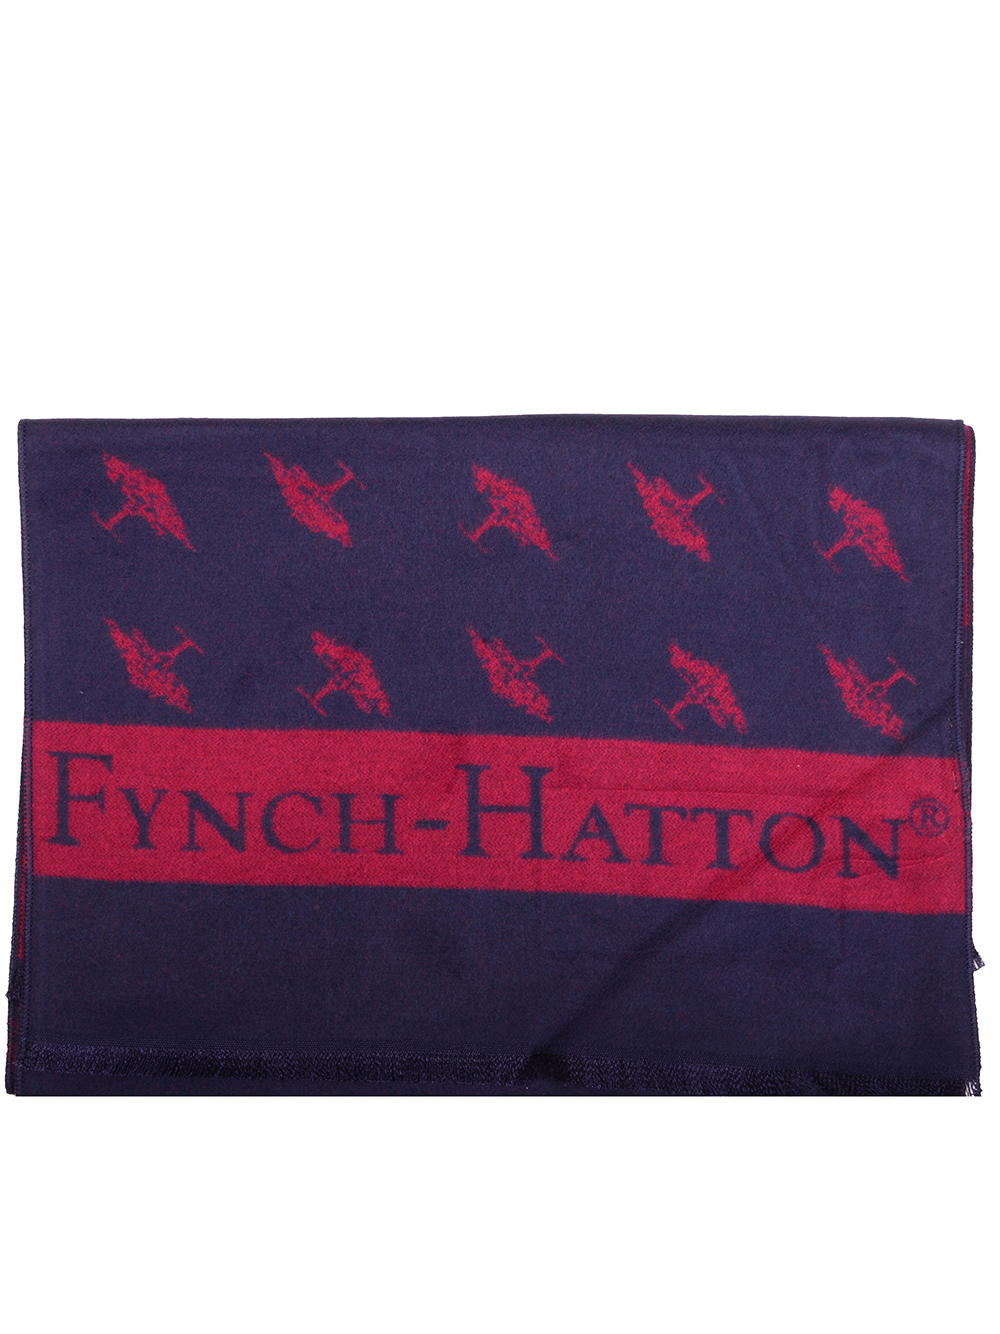 FYNCH-HATTON Κασκόλ 1220 0100-1600 ΜΠΛΕ